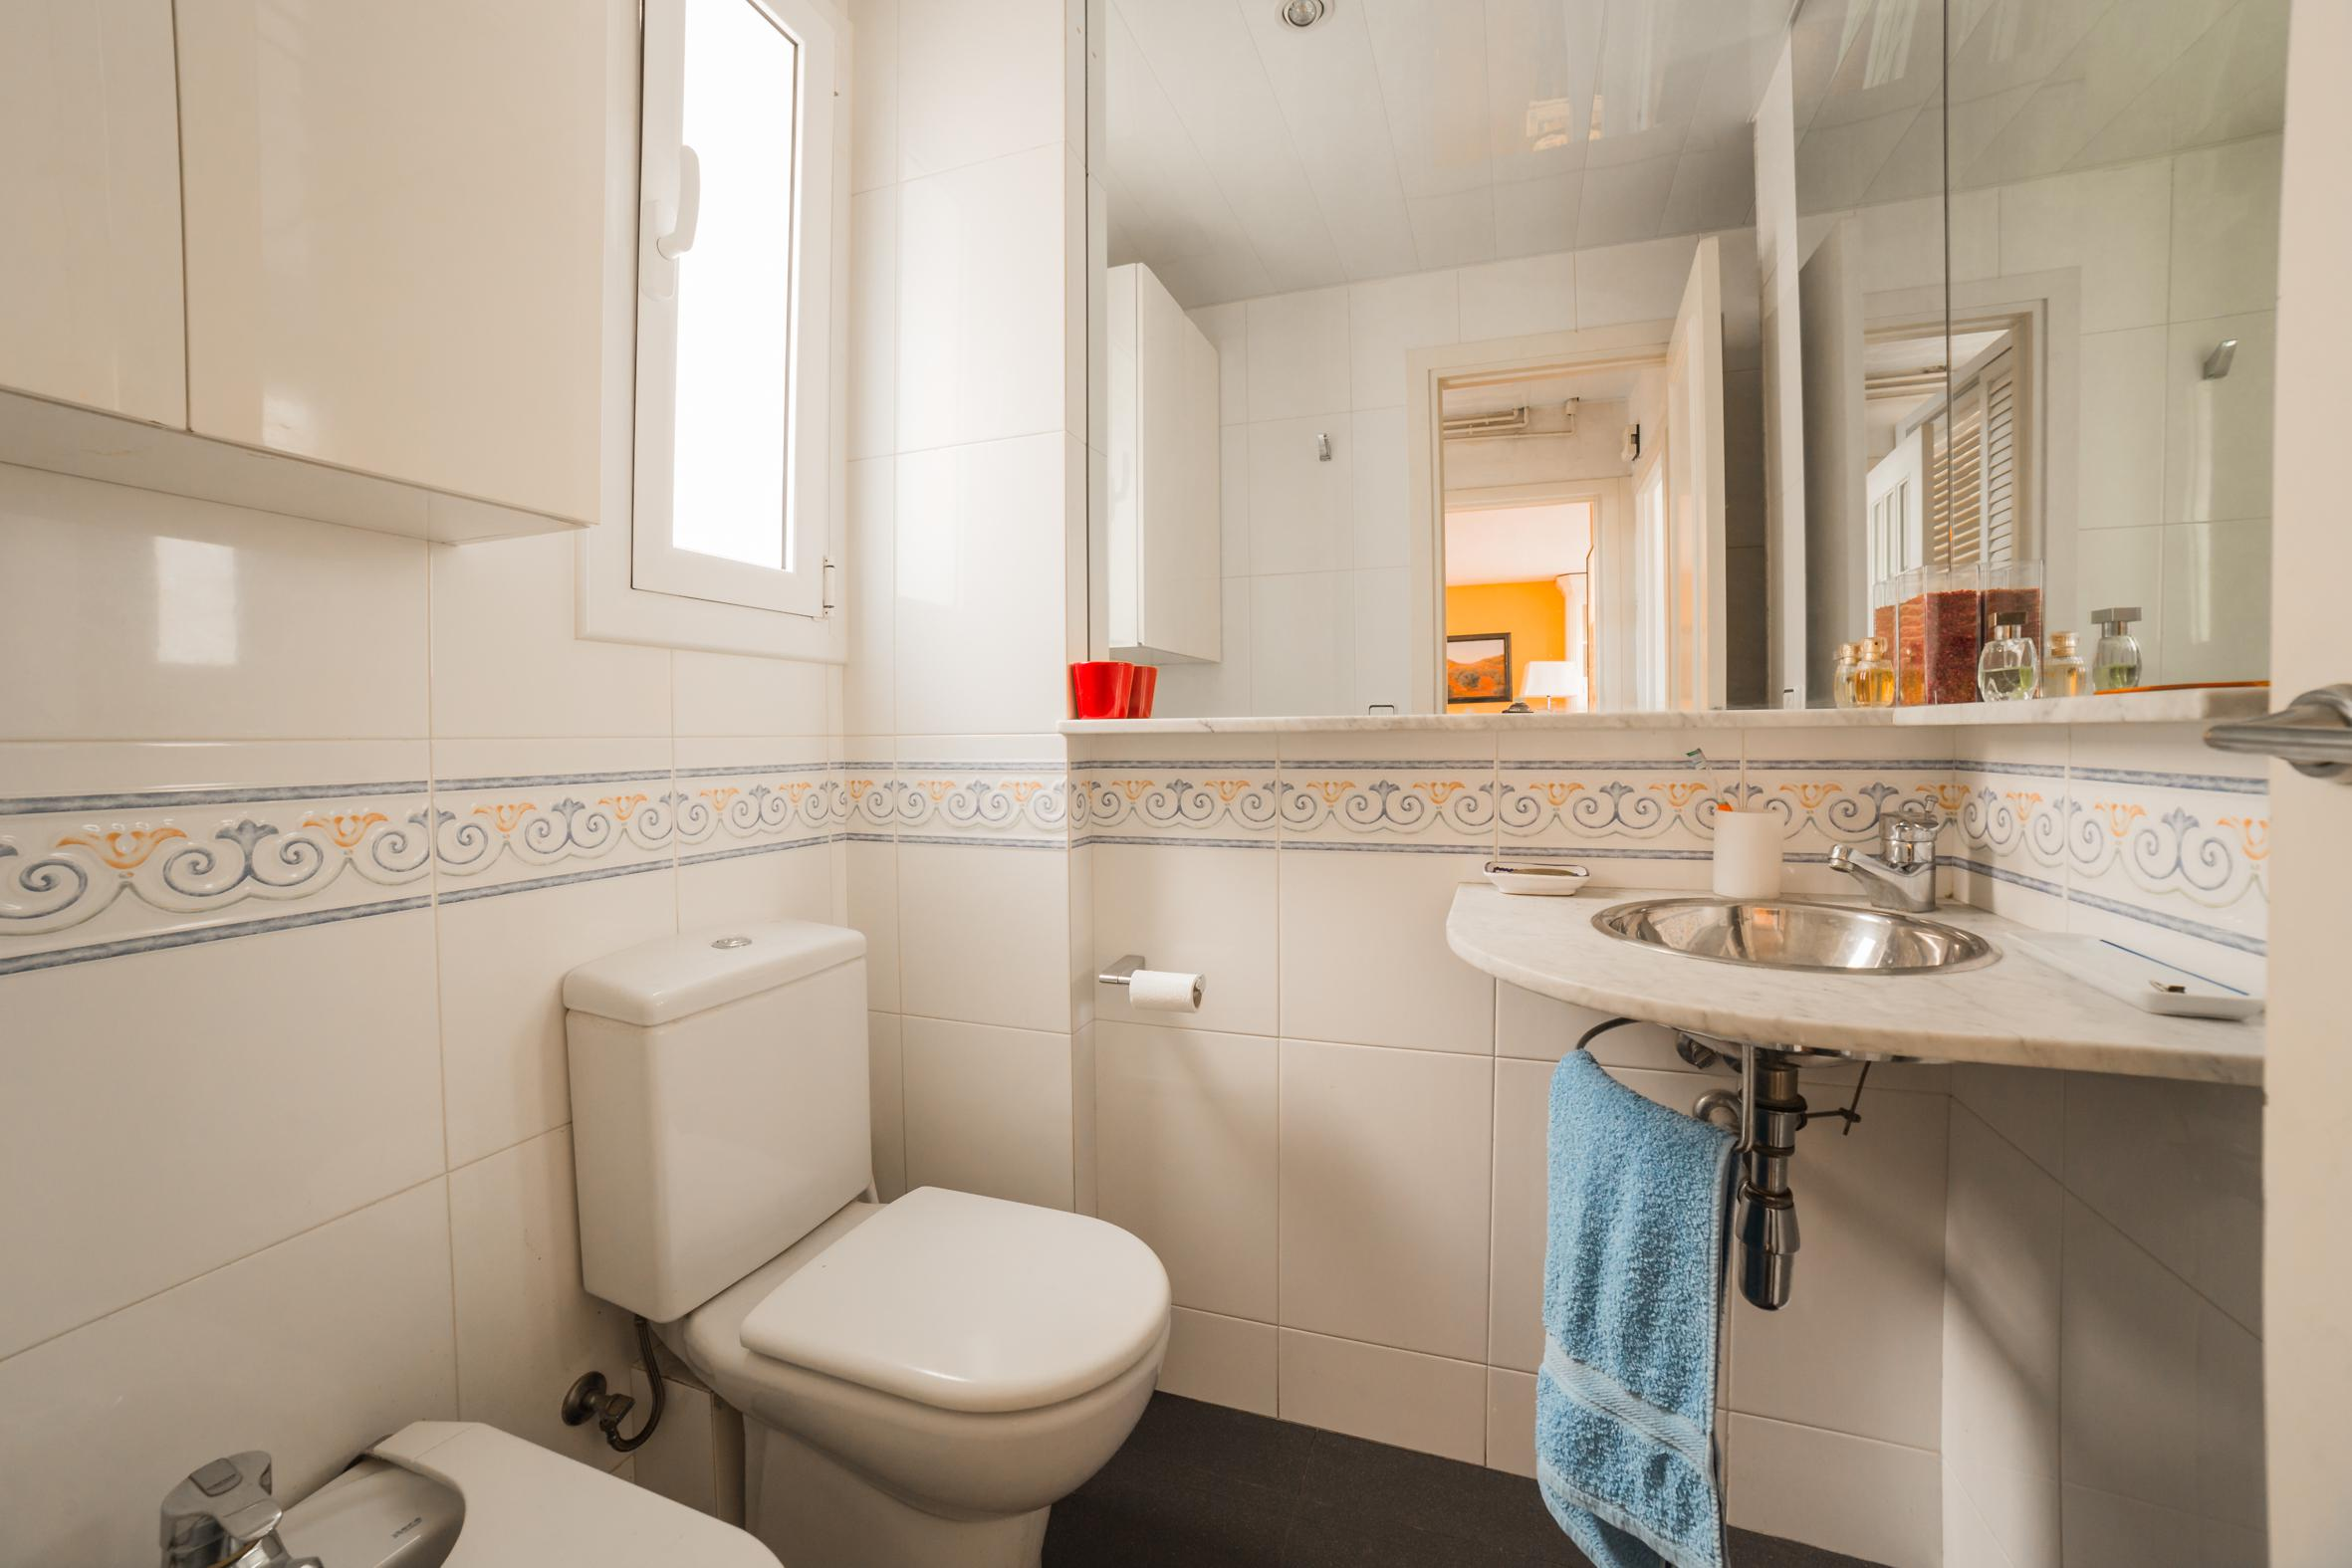 253515 Apartamento en venta en Sarrià-Sant Gervasi, Sant Gervasi-Galvany 6